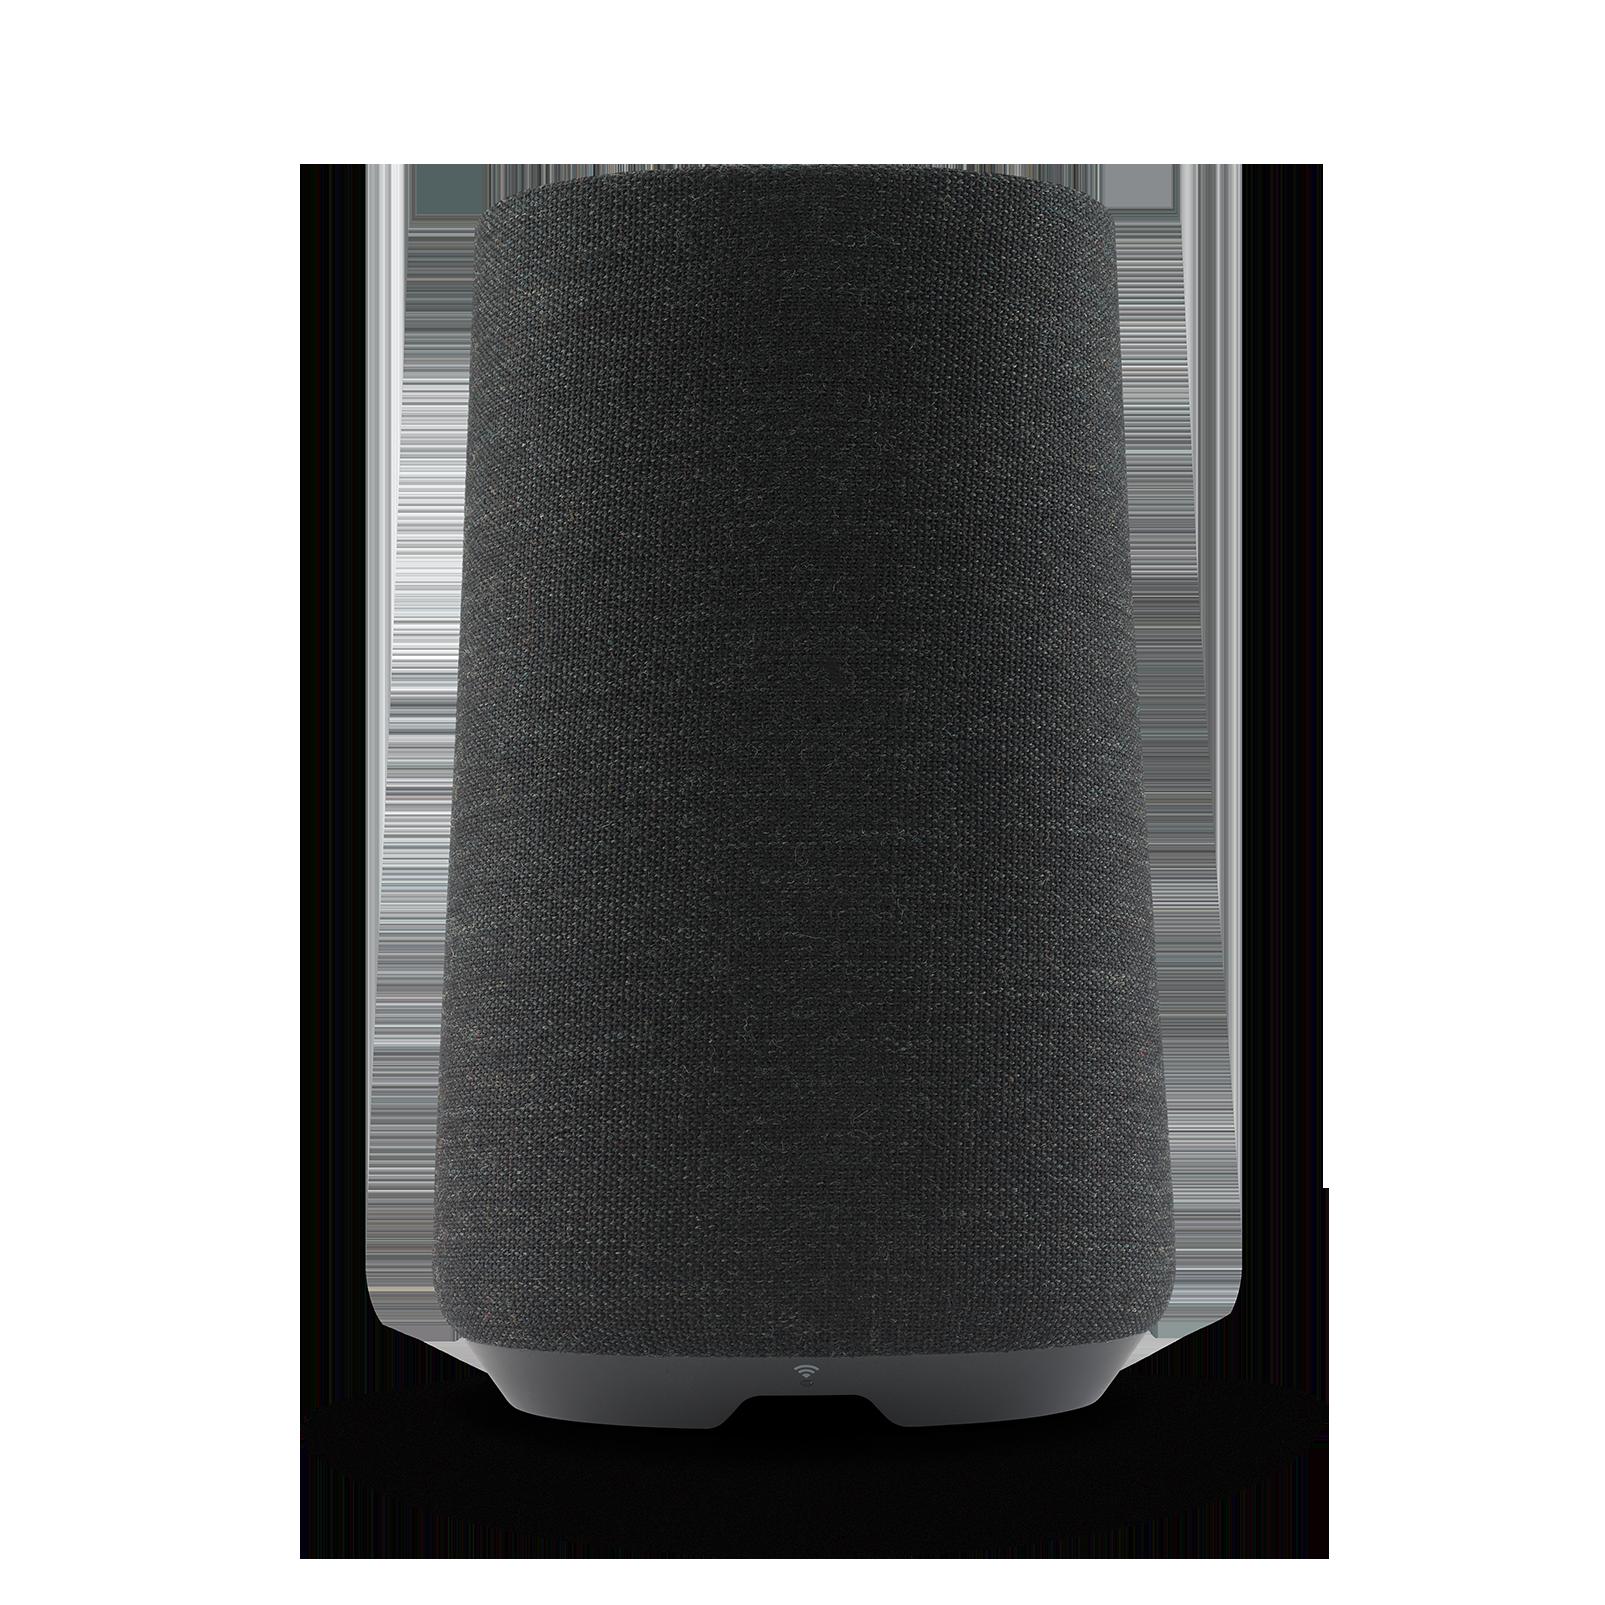 Harman Kardon Citation 100 - Black - The smallest, smartest home speaker with impactful sound - Back